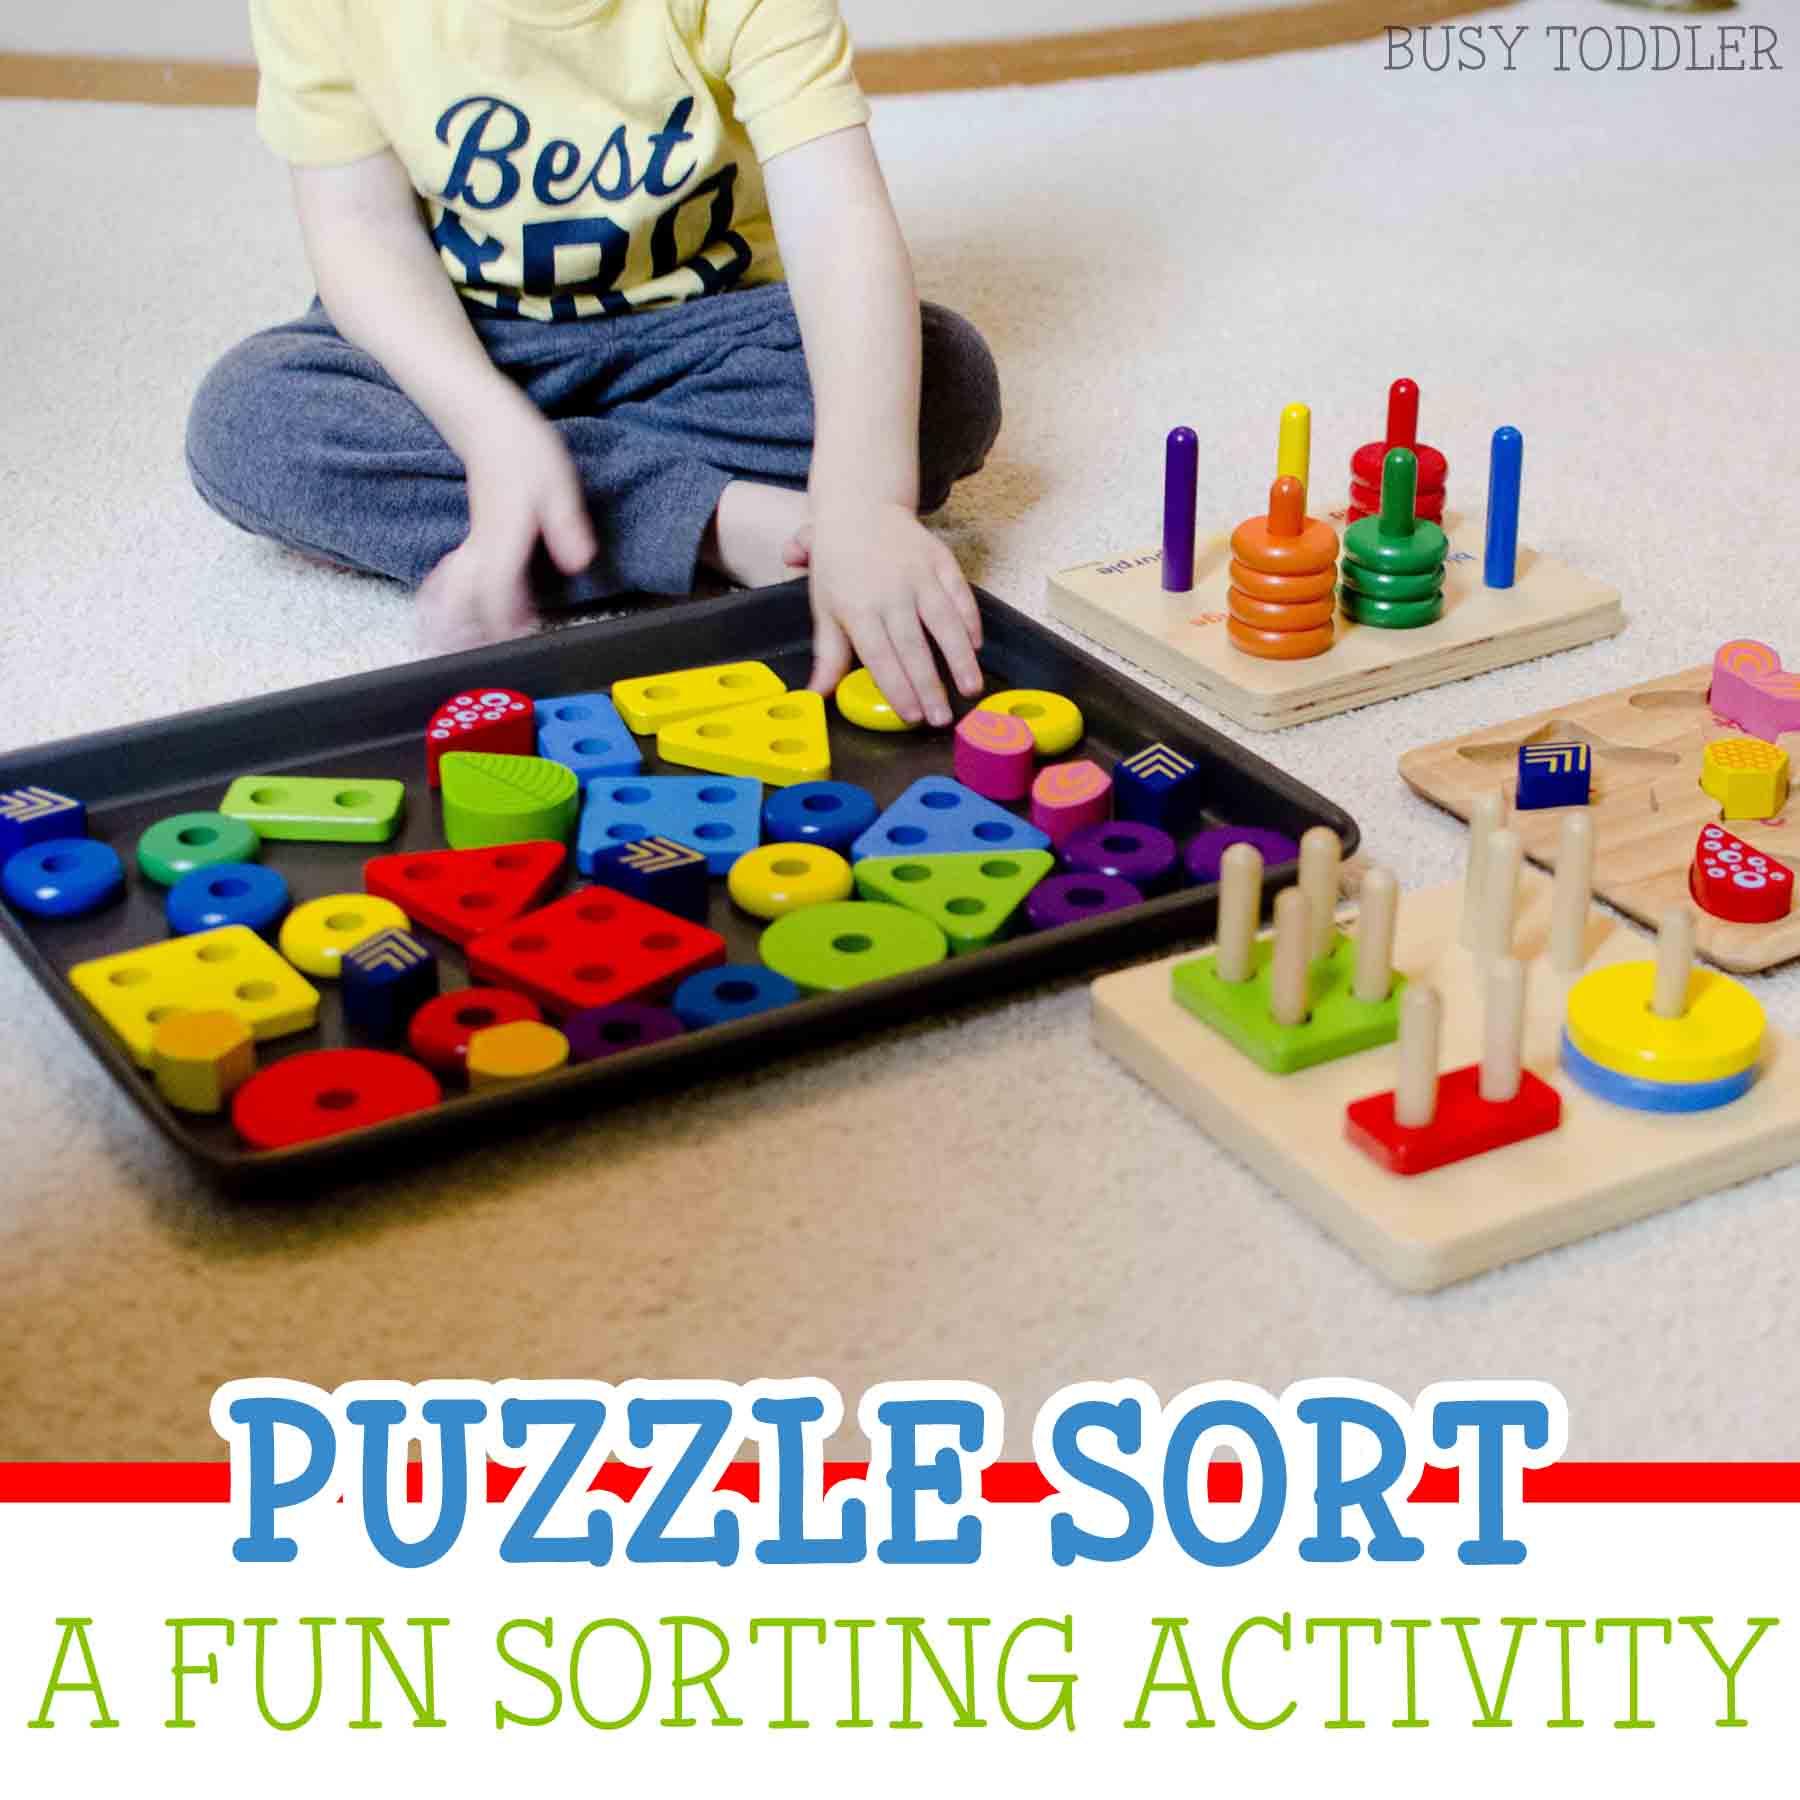 puzzlesort6